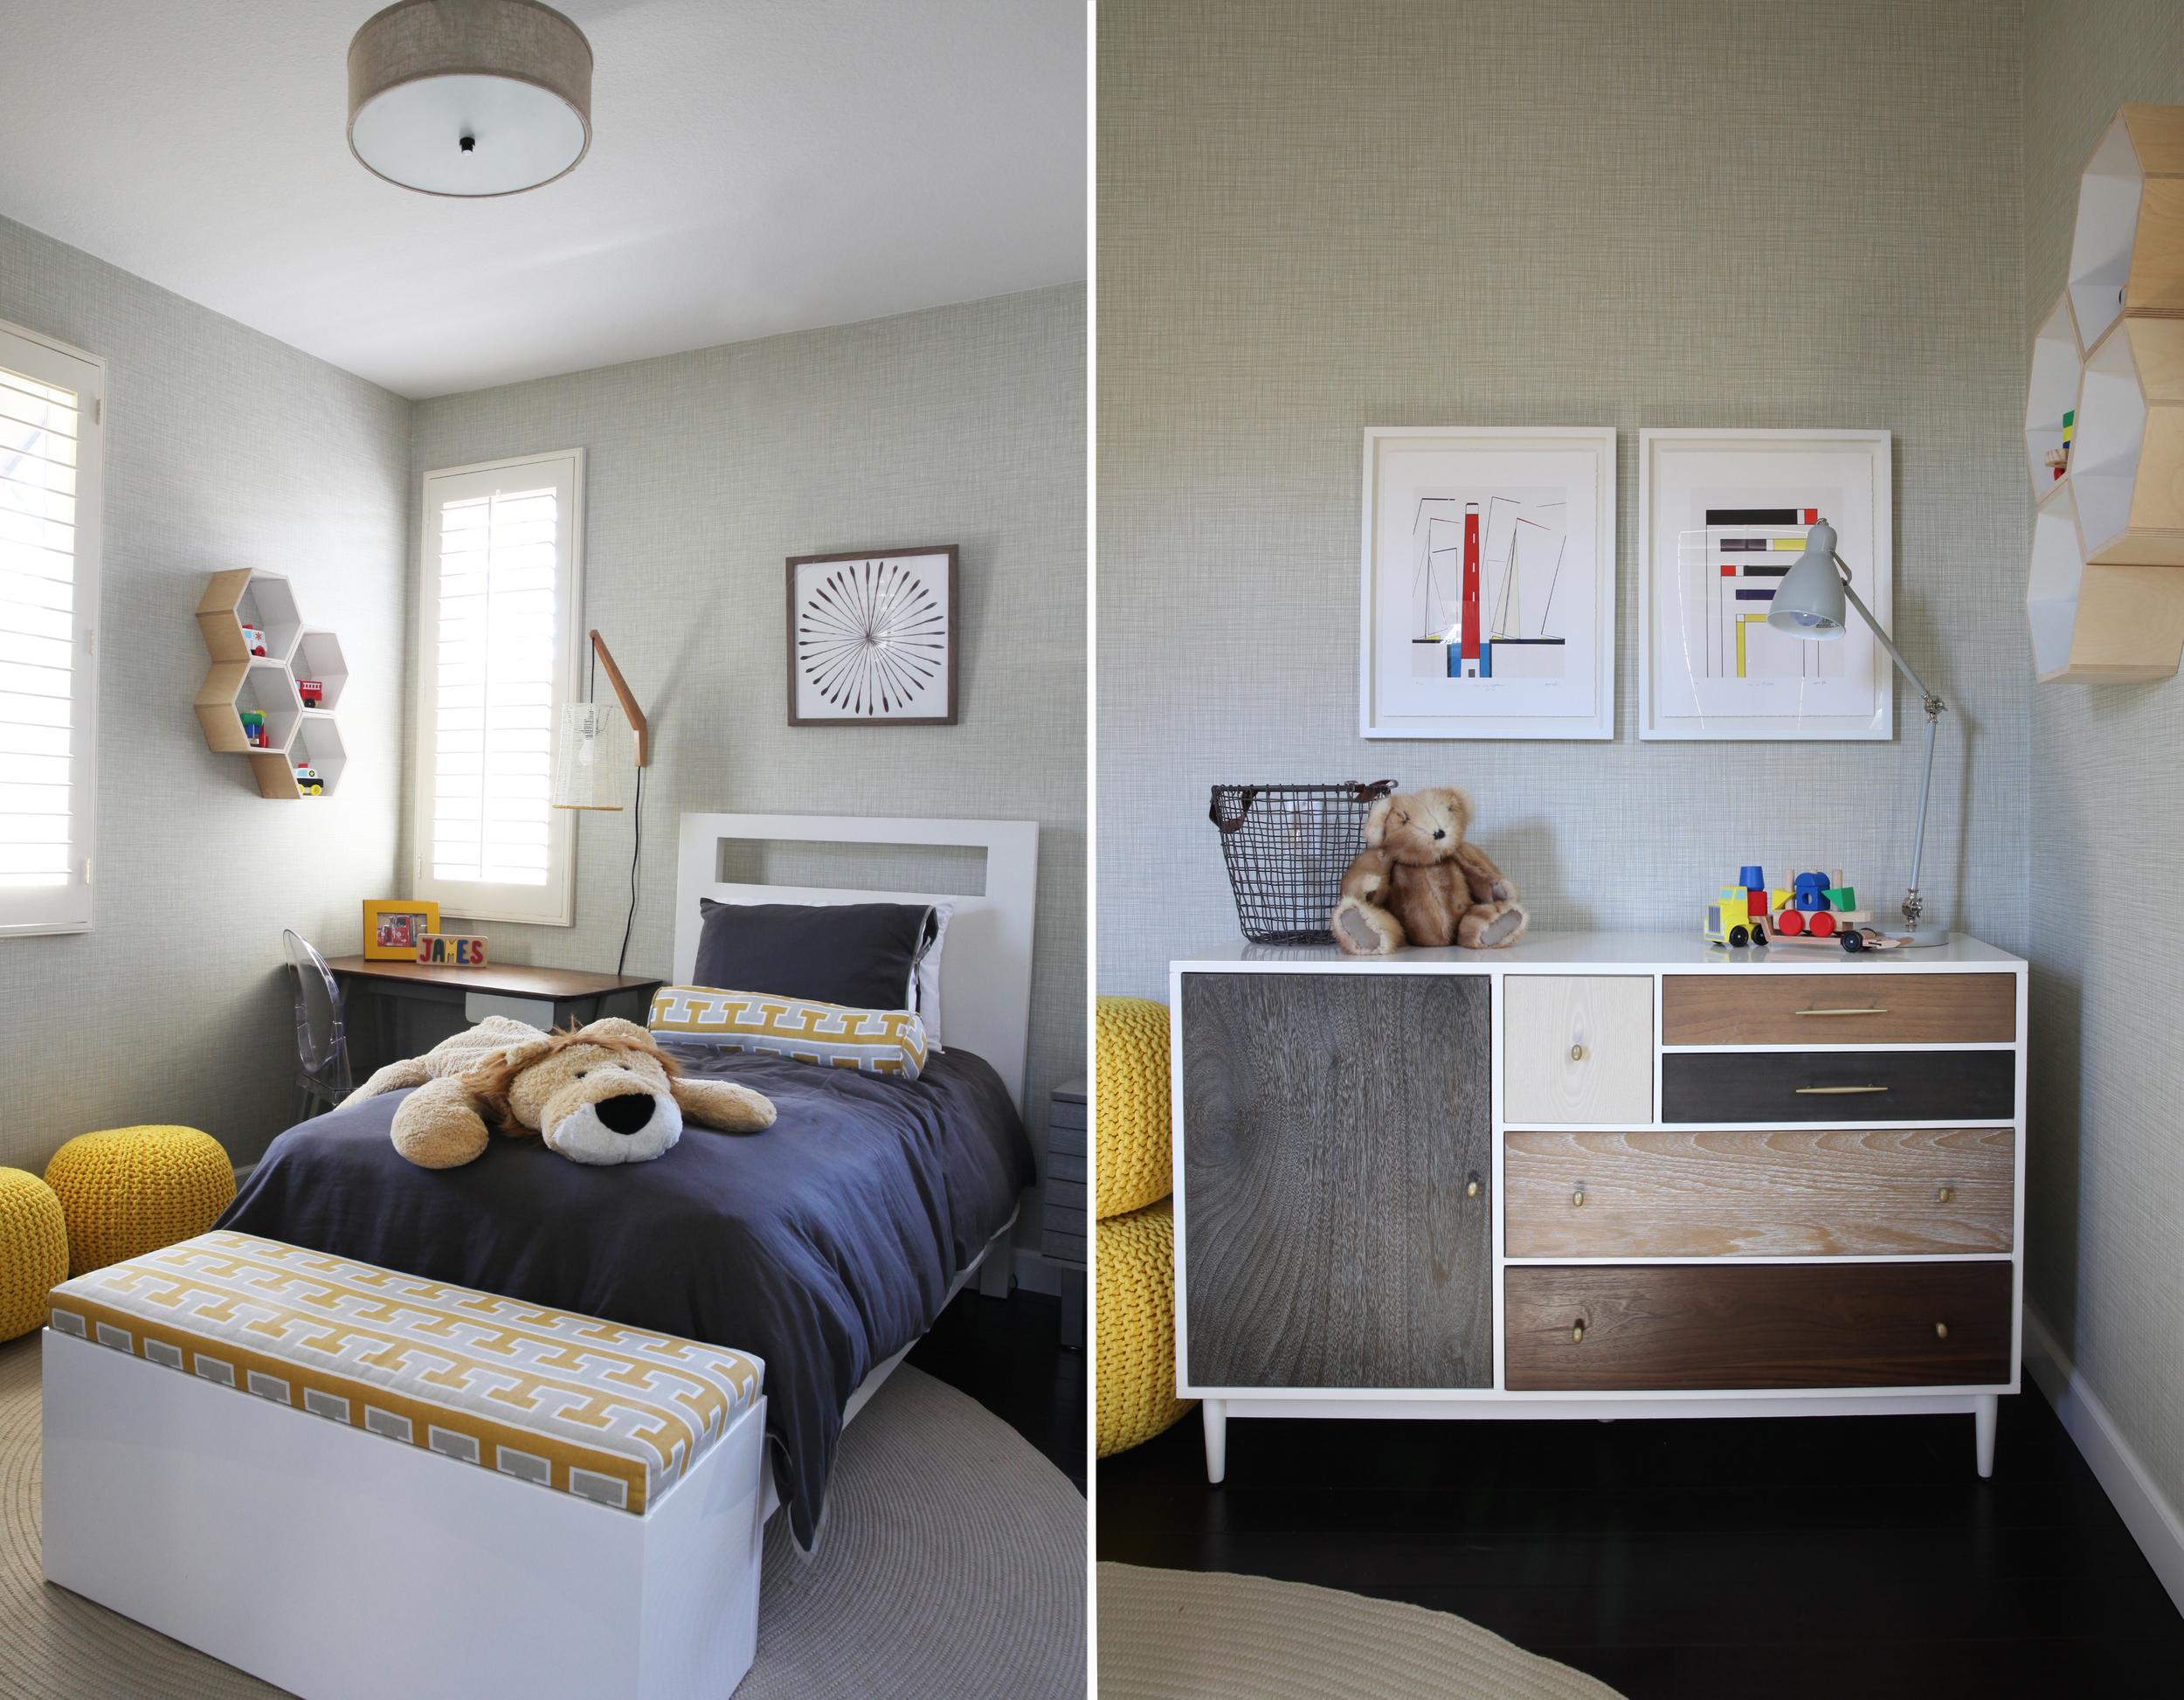 irvine interior designer brittany stiles orange county little boys kids room yellow gray.jpg